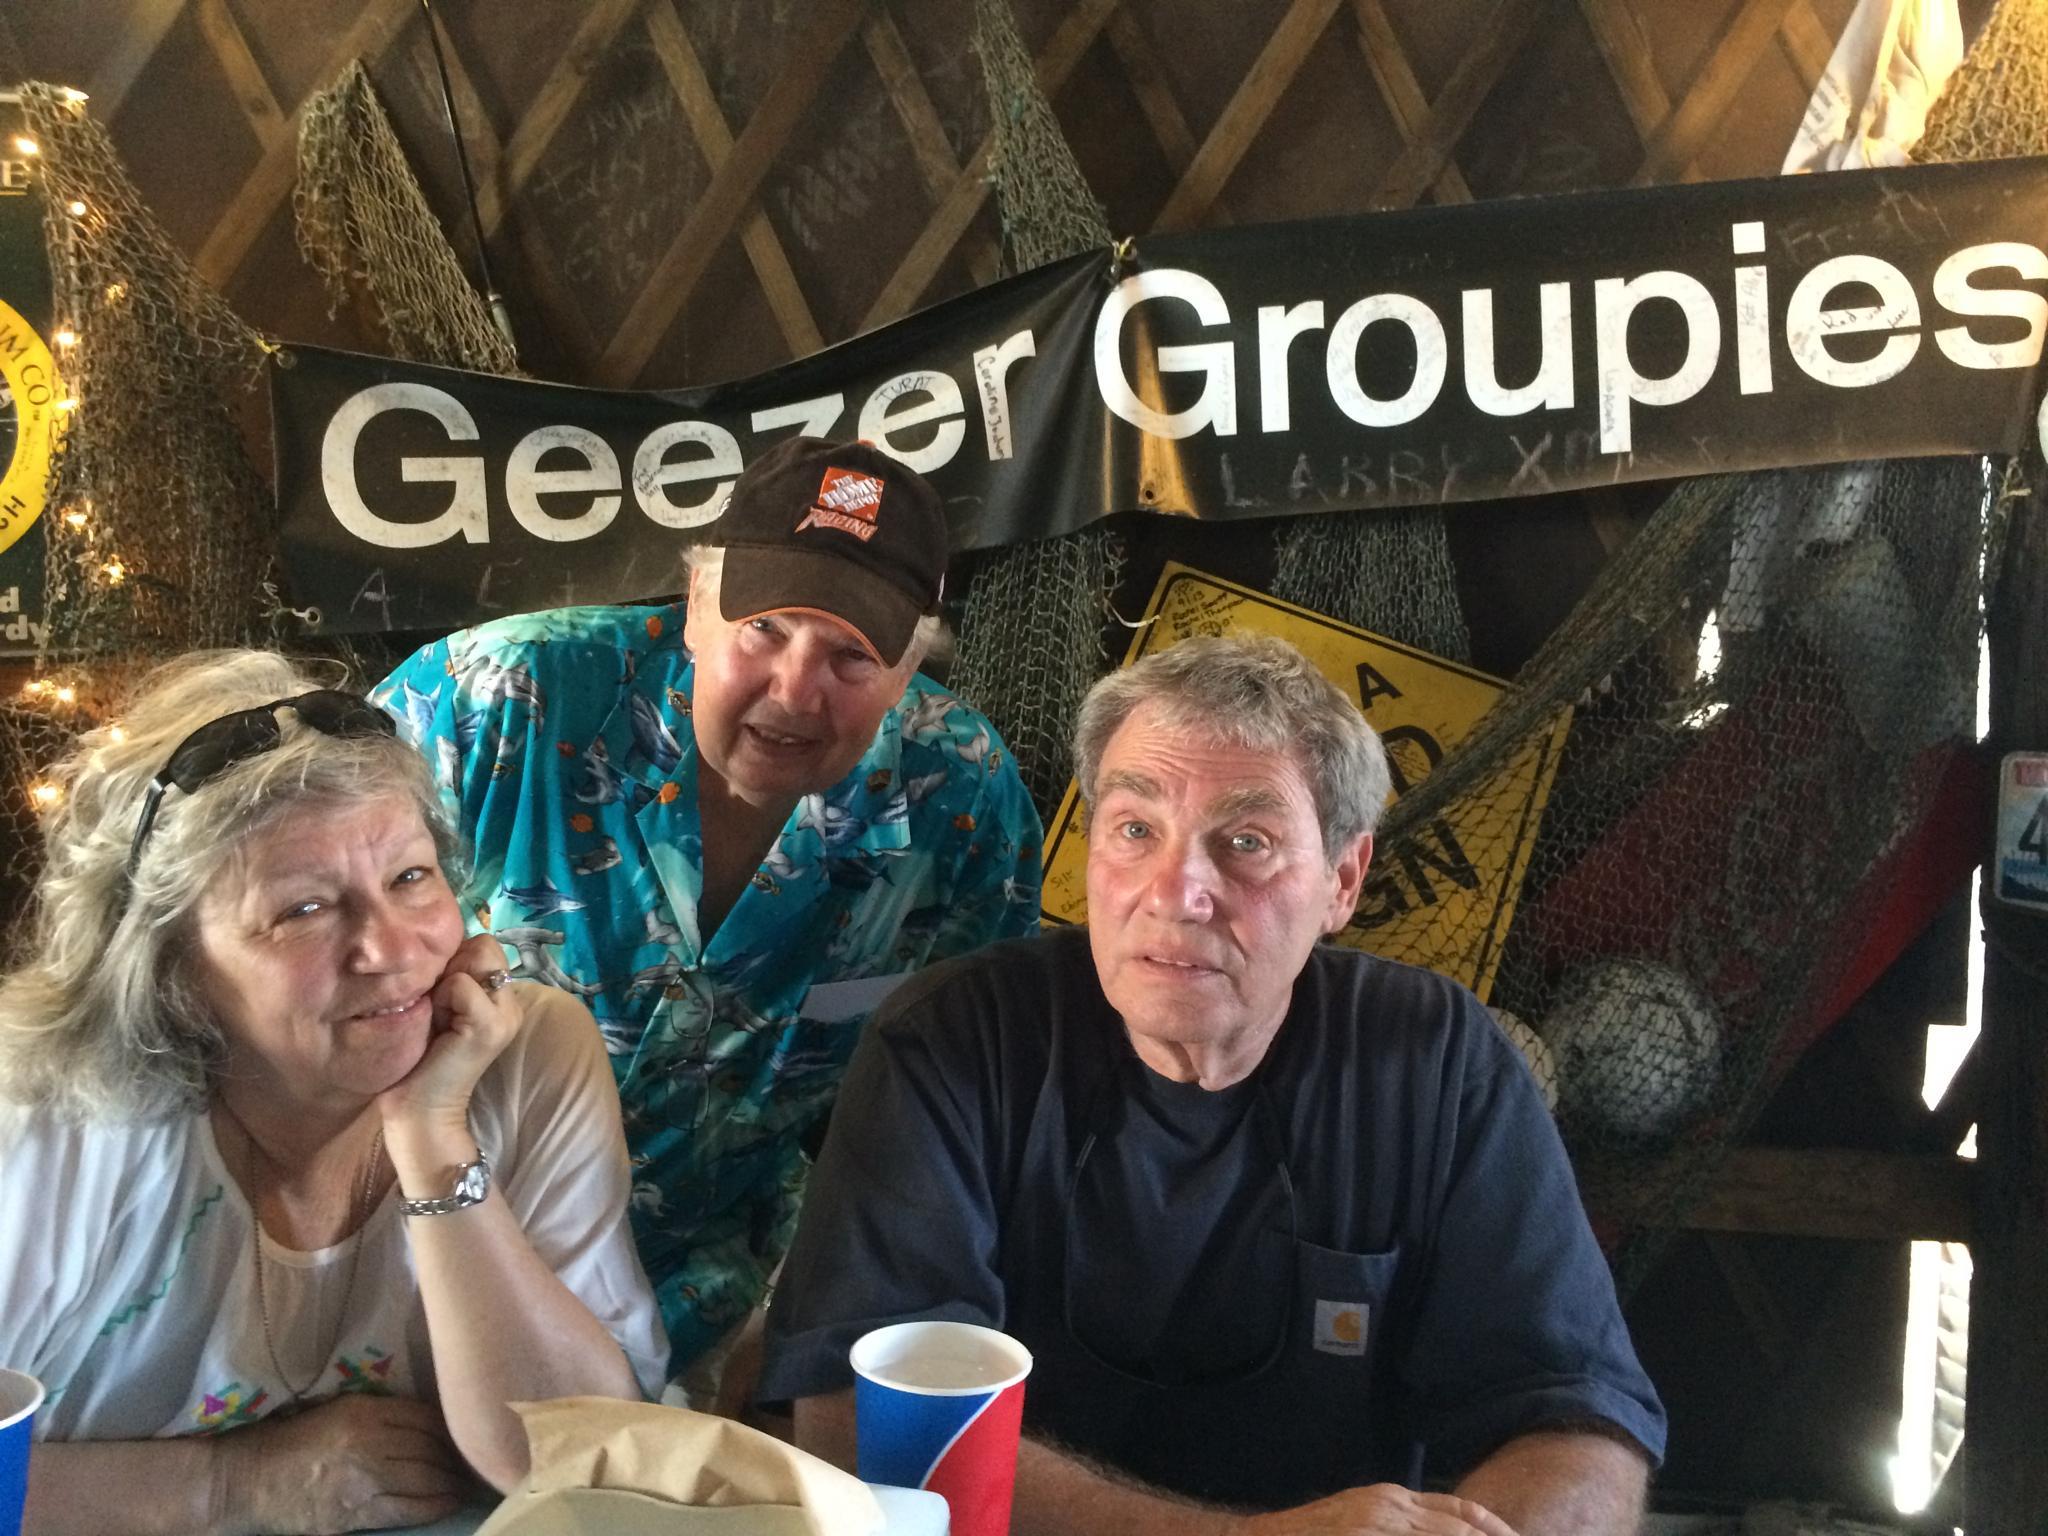 Geezer Groupies by debbie.k.alexander.3